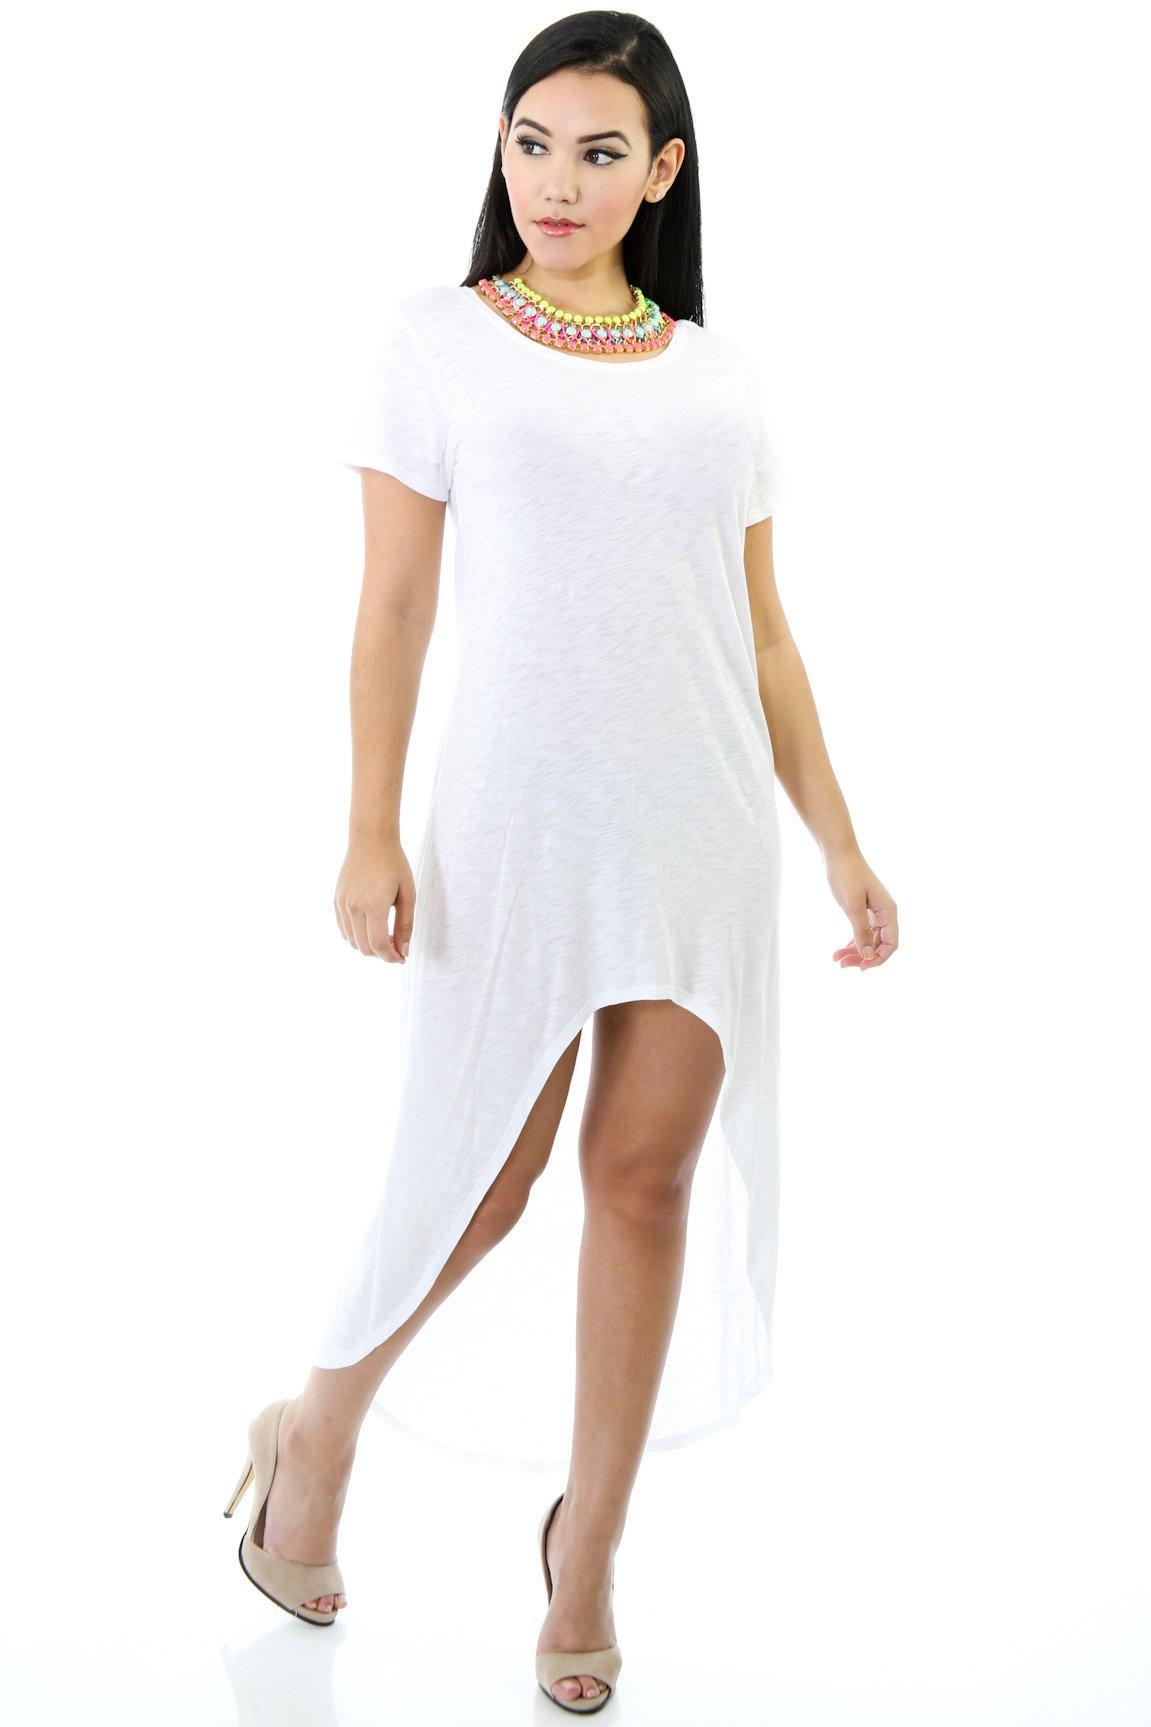 Smooth Sheer Dress